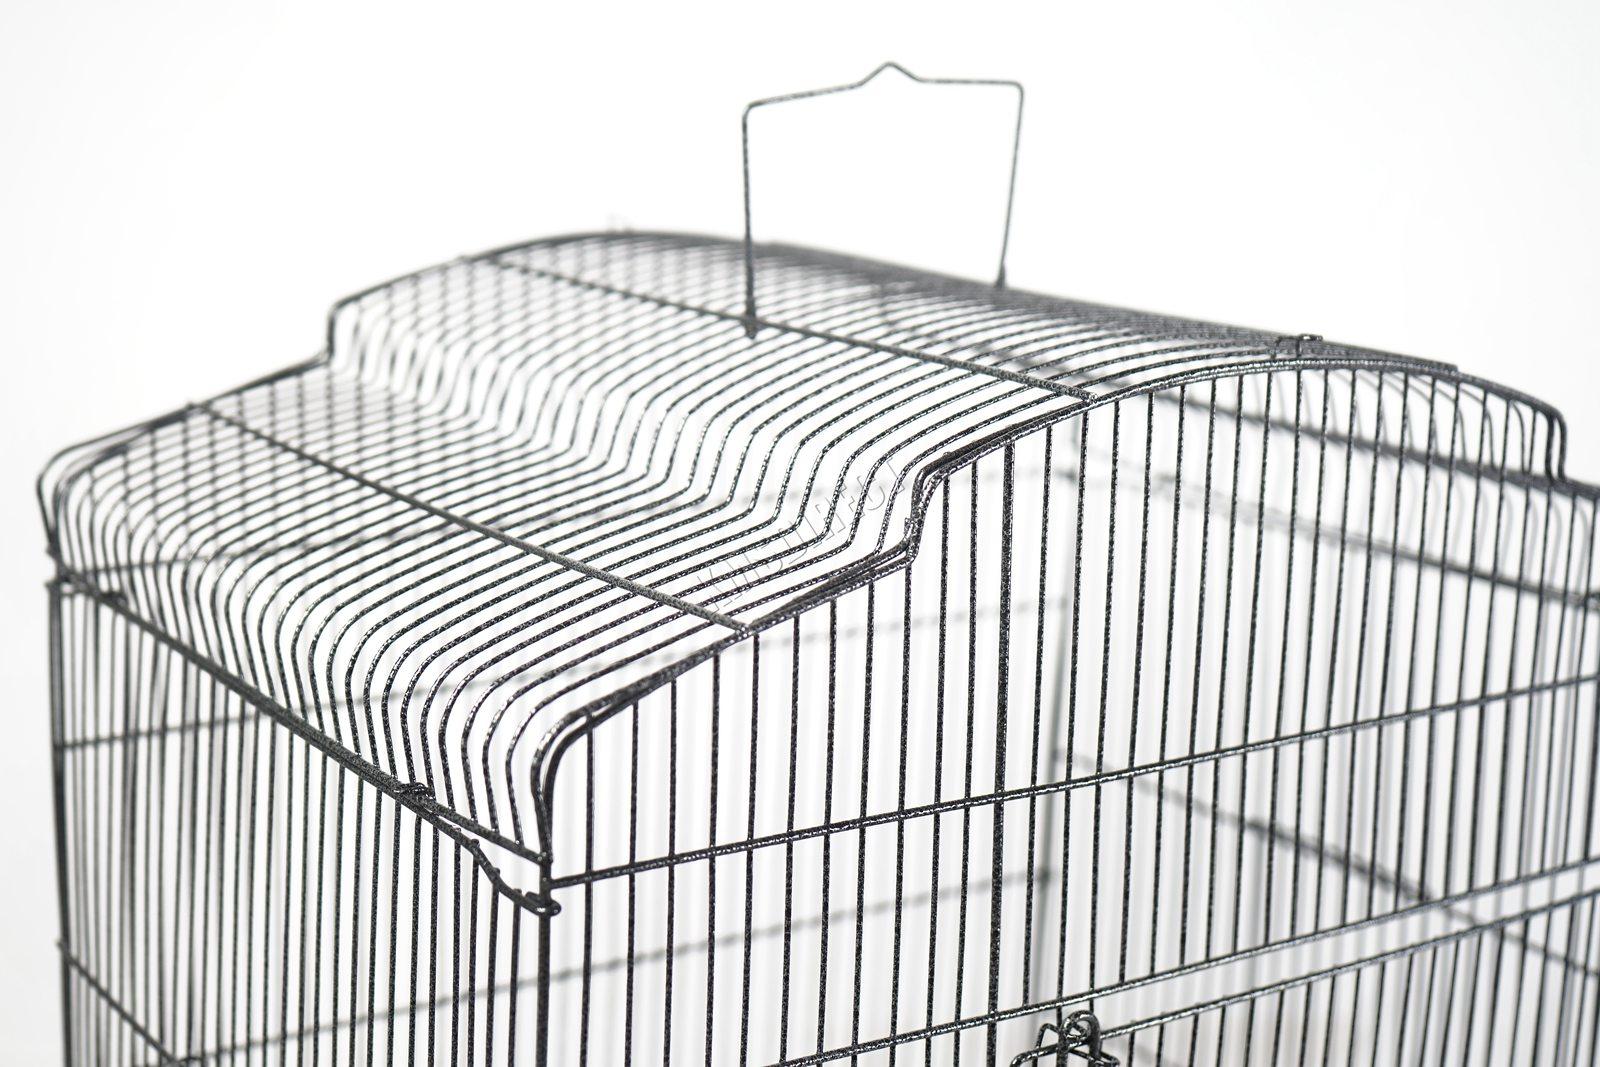 BIRD CAGE METAL MBC 05 HAMMERED SILVER KMSWM07 - Foxhunter Grande Metal Jaula con Soporte Pajarera Loro Periquito Canario Cacatua